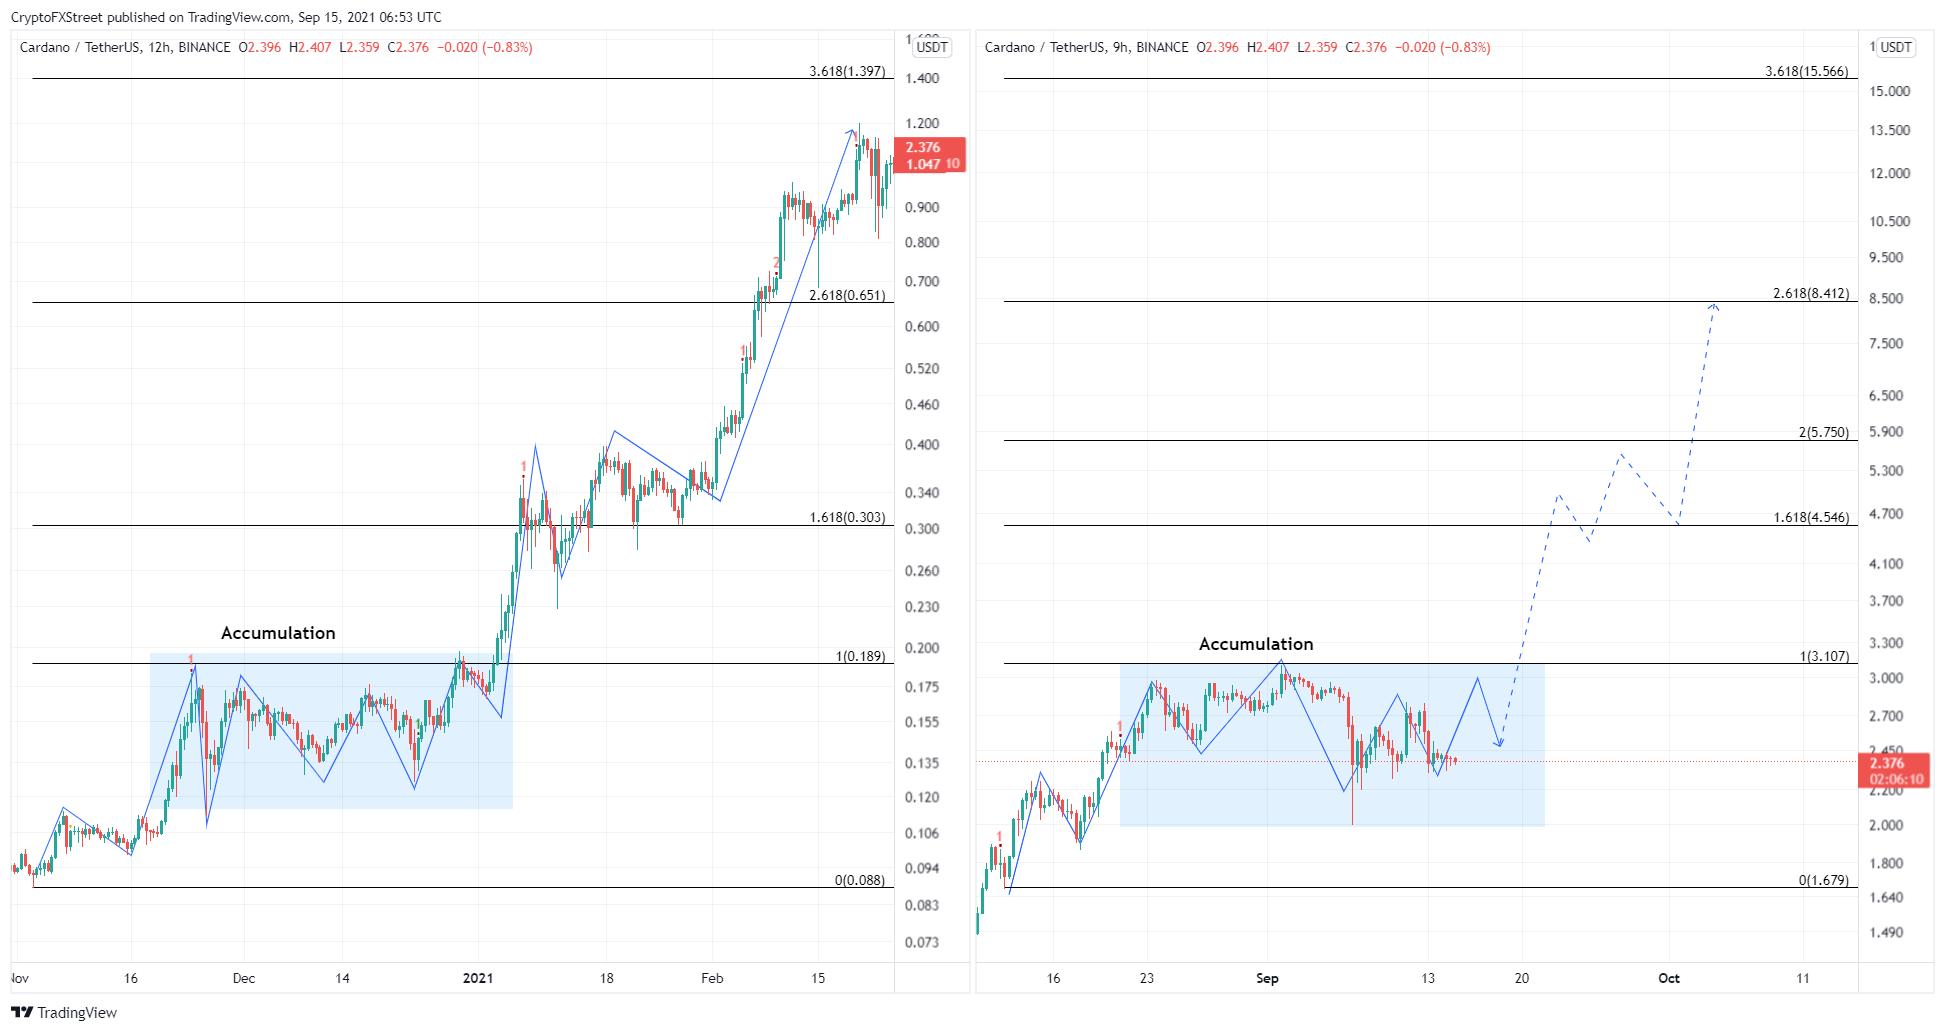 Prediction des prix des crypto monnaies Ethereum Cardano Ripple